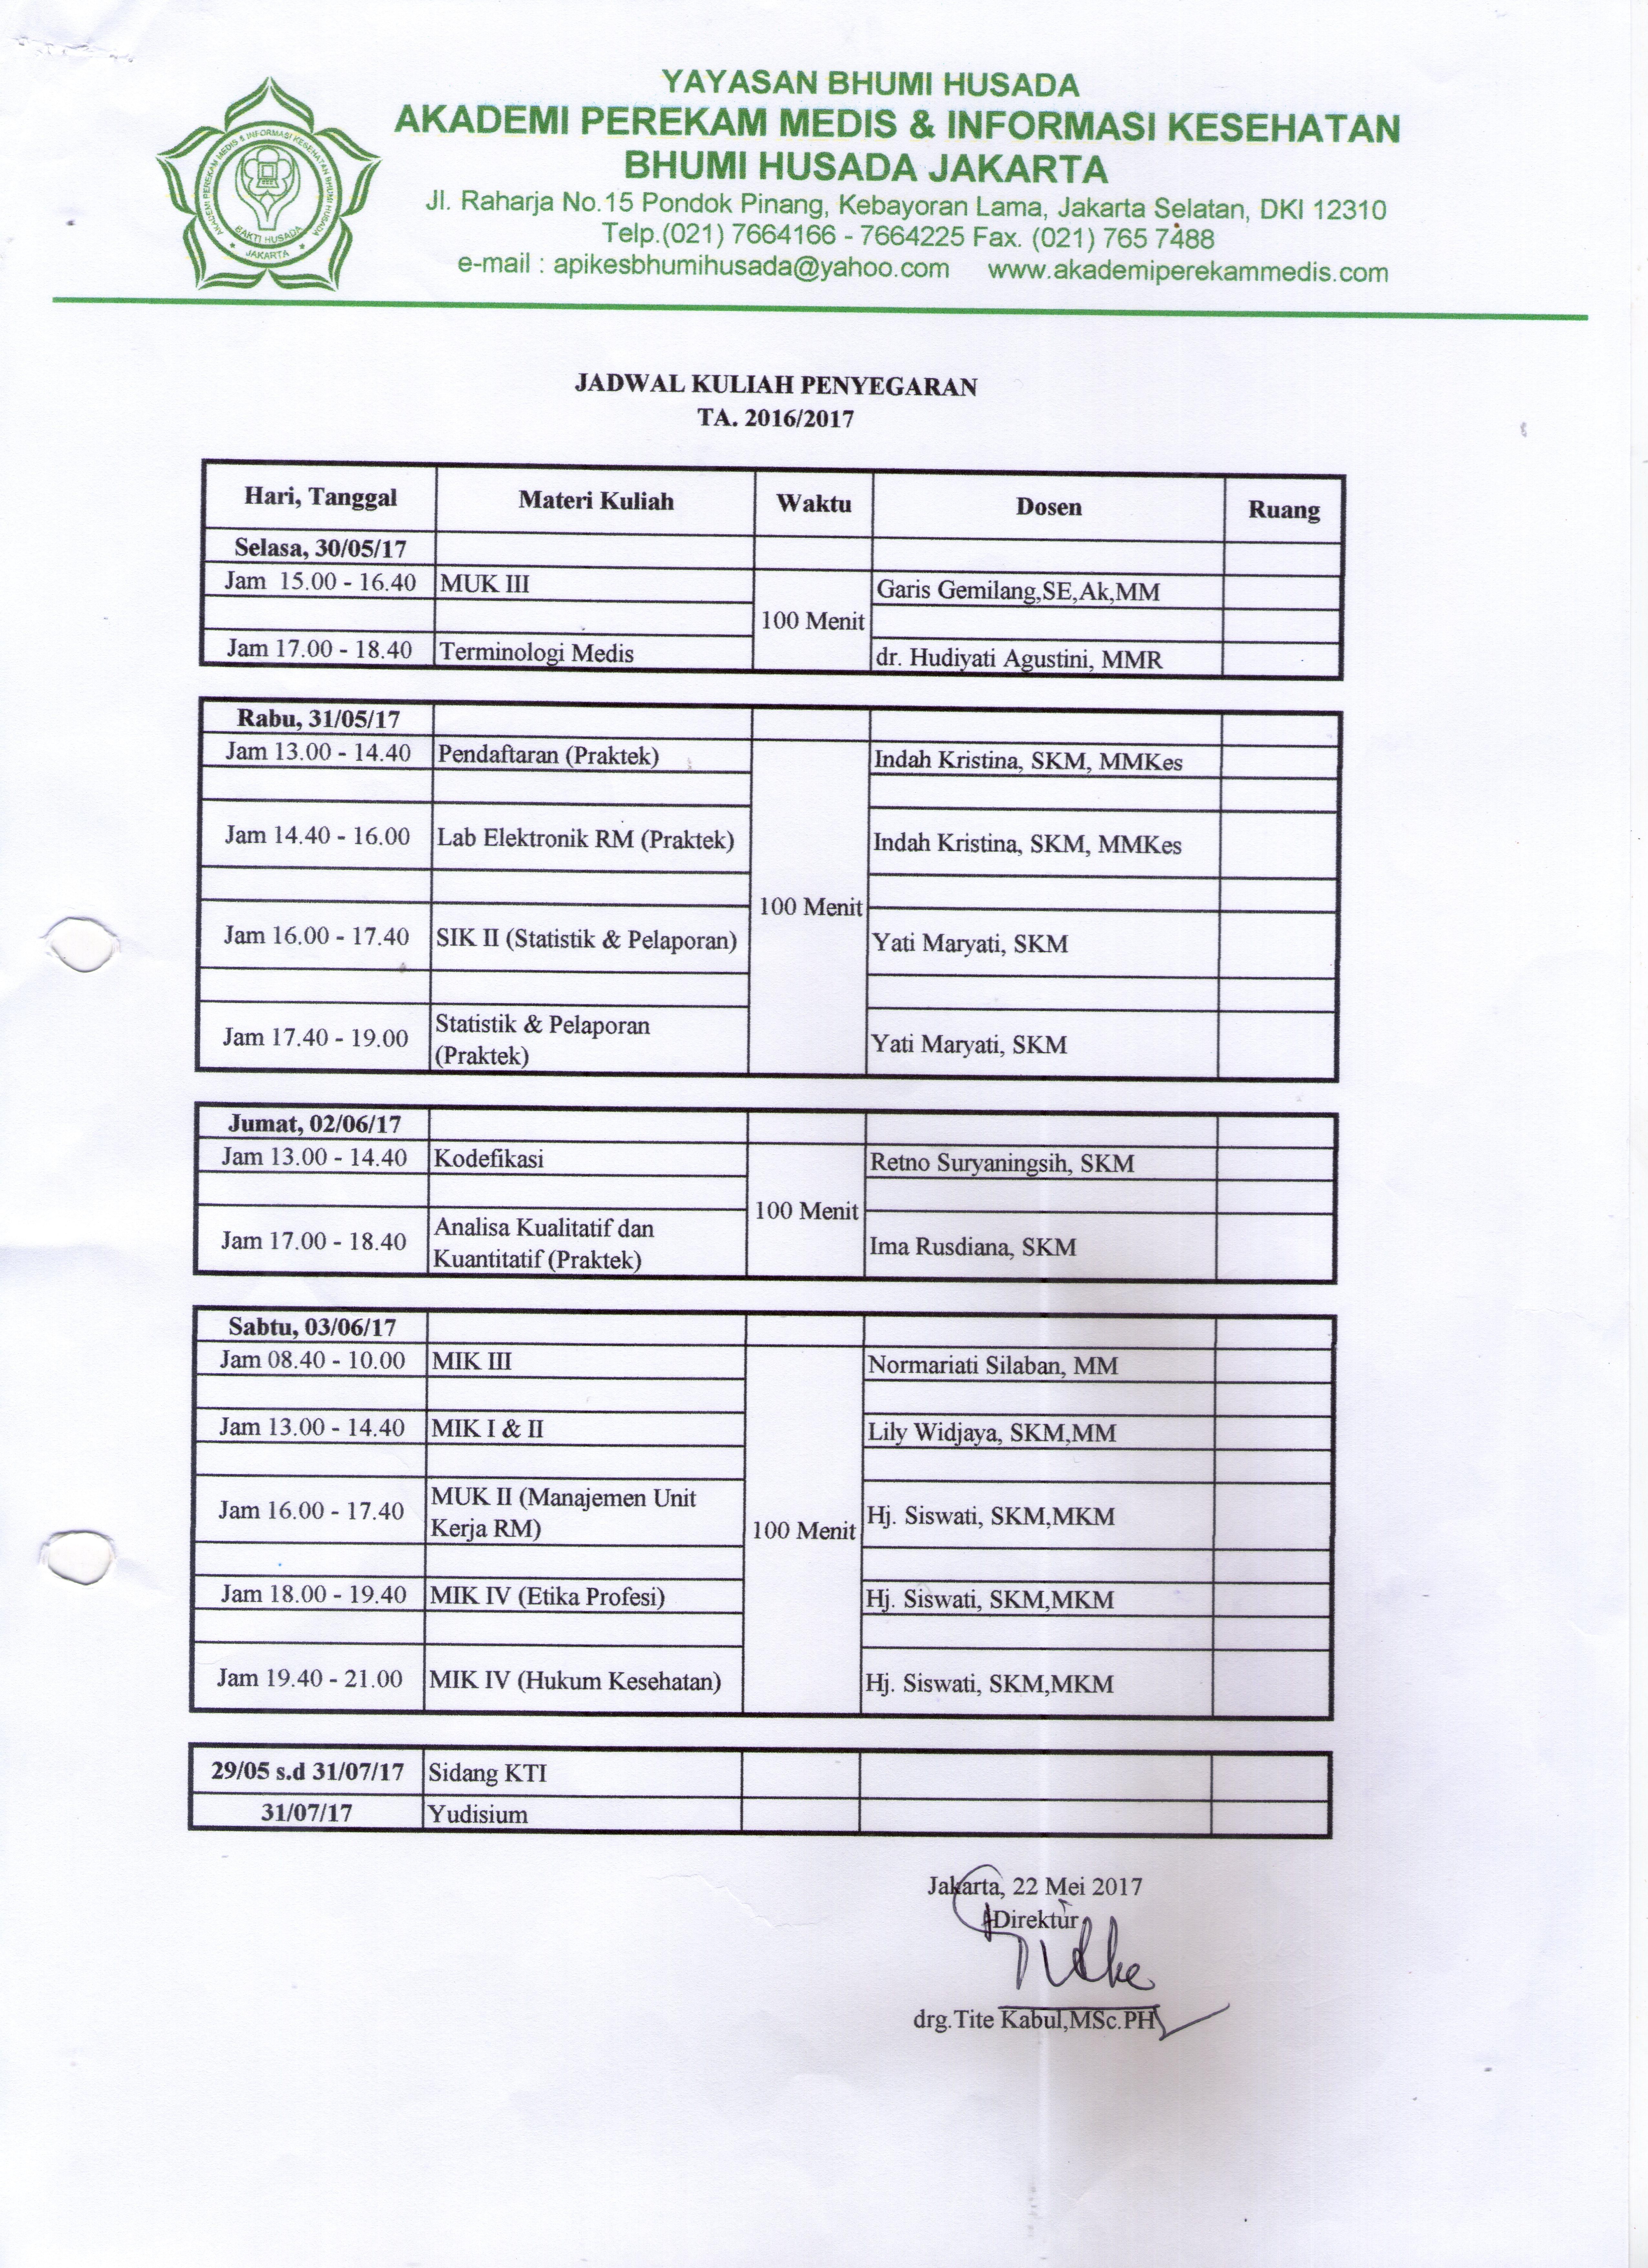 Jadwal Kuliah Penyegaran Dan Jadwal Ujian Akhir Program Teori & Praktek Mahasiswa Semester Akhir TA. 2016-2017